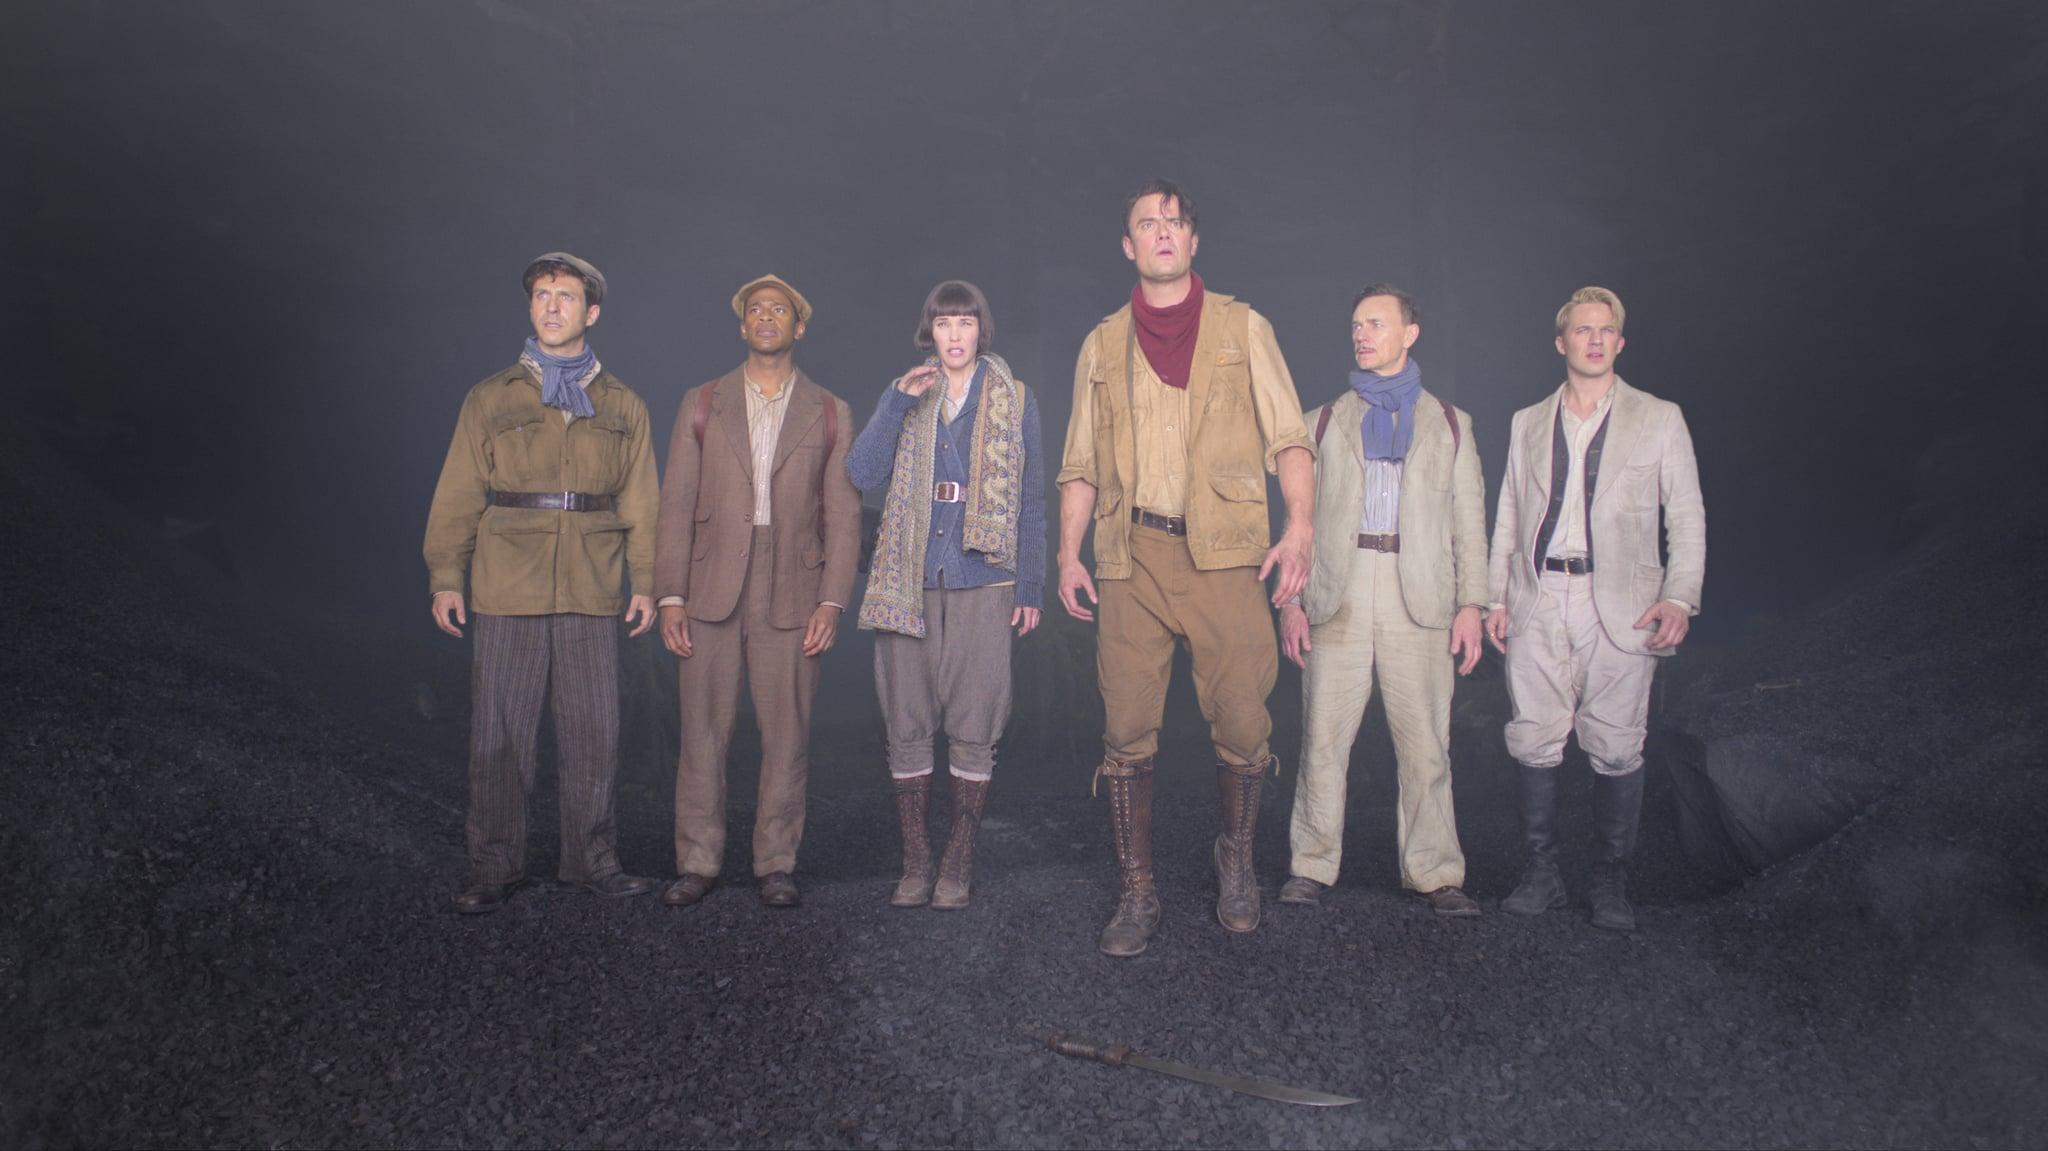 JUPITER'S LEGACY (L-R) DAVID JULIAN HIRSH as R. CONRAD, MIKE WADE as FITZ SMALL, LESLIE BIBB as GRACE SAMPSON, JOSH DUHAMEL as SHELDON SAMPSON, BEN DANIELS as WALTER SAMPSON, and MATT LANTER as GEORGE HUTCHENCE in episode 7 of JUPITER'S LEGACY. Cr. COURTESY OF NETFLIX  2021